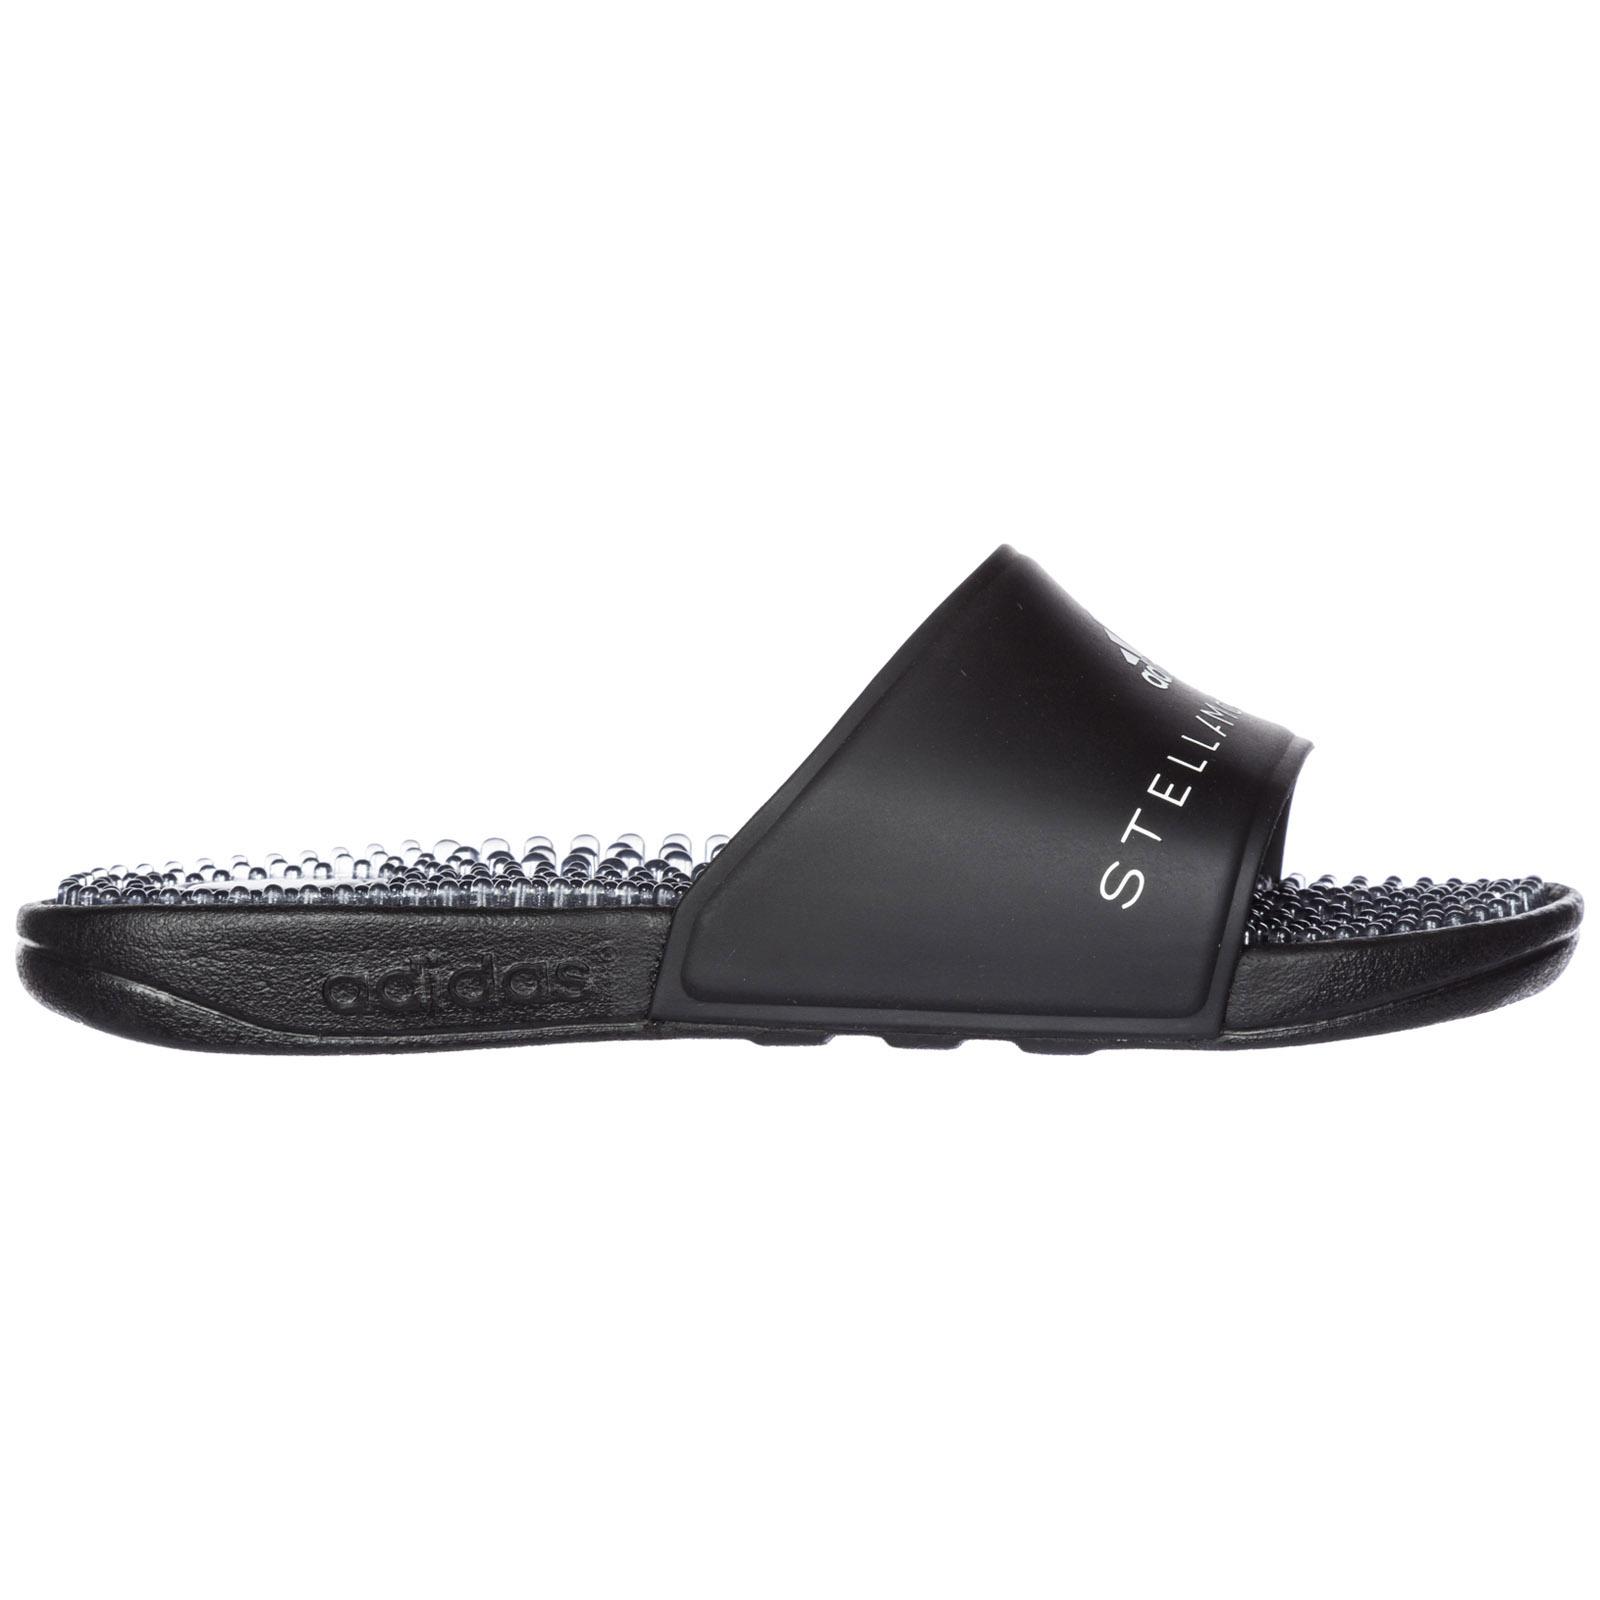 1bb9089a34b9 Adidas by Stella McCartney Women s rubber slippers sandals adissage w